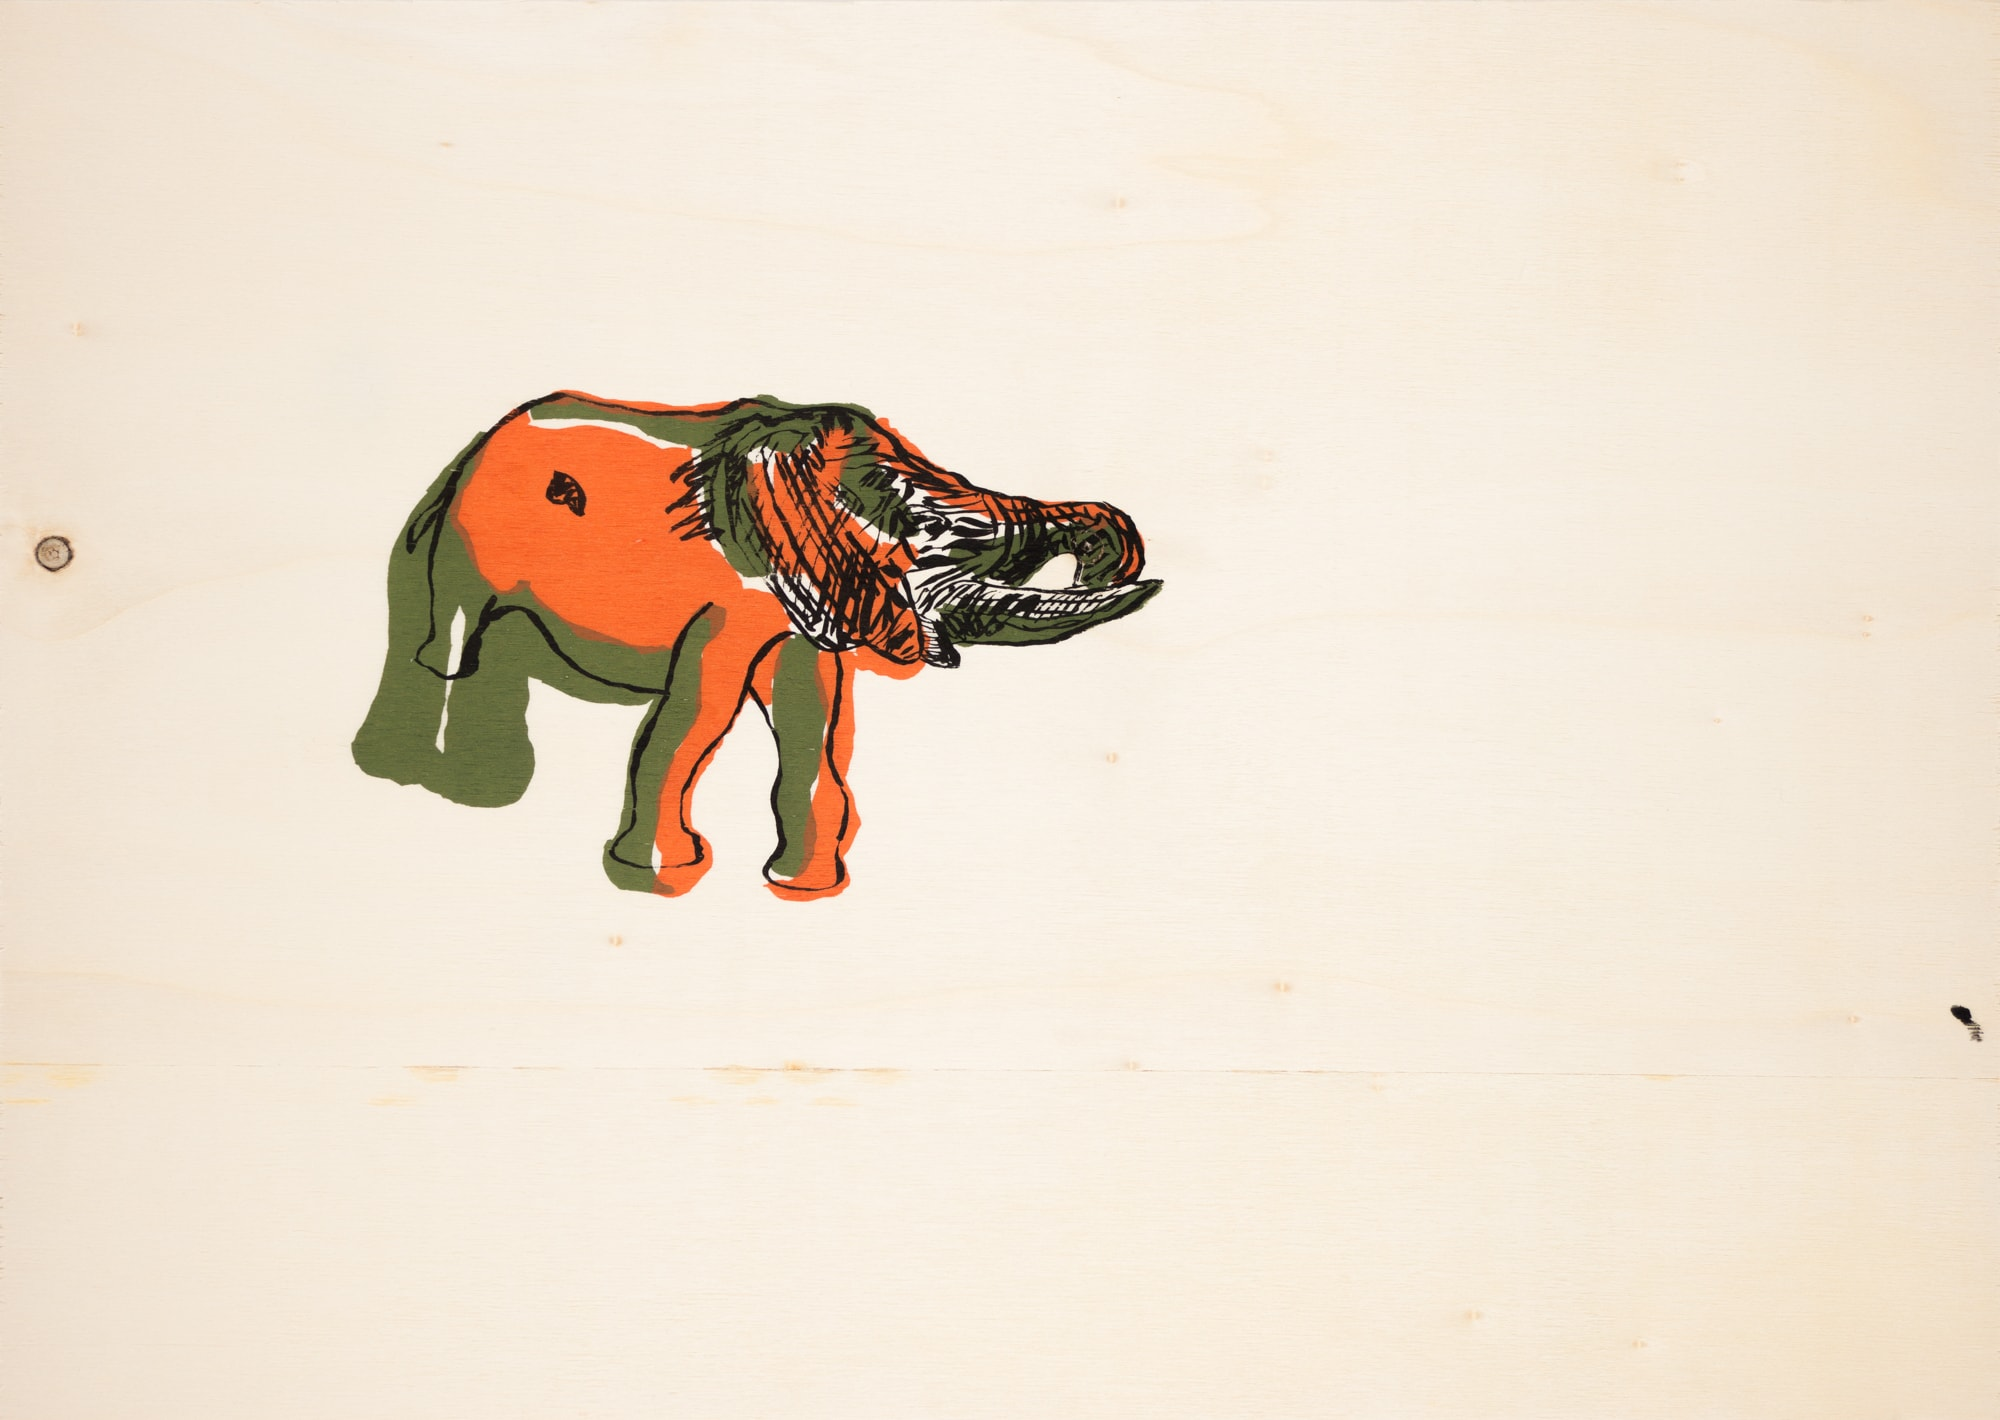 Druck, Siebdruck auf Holz, 42cm x 29,8cm, Elephant, artist: Franziska King